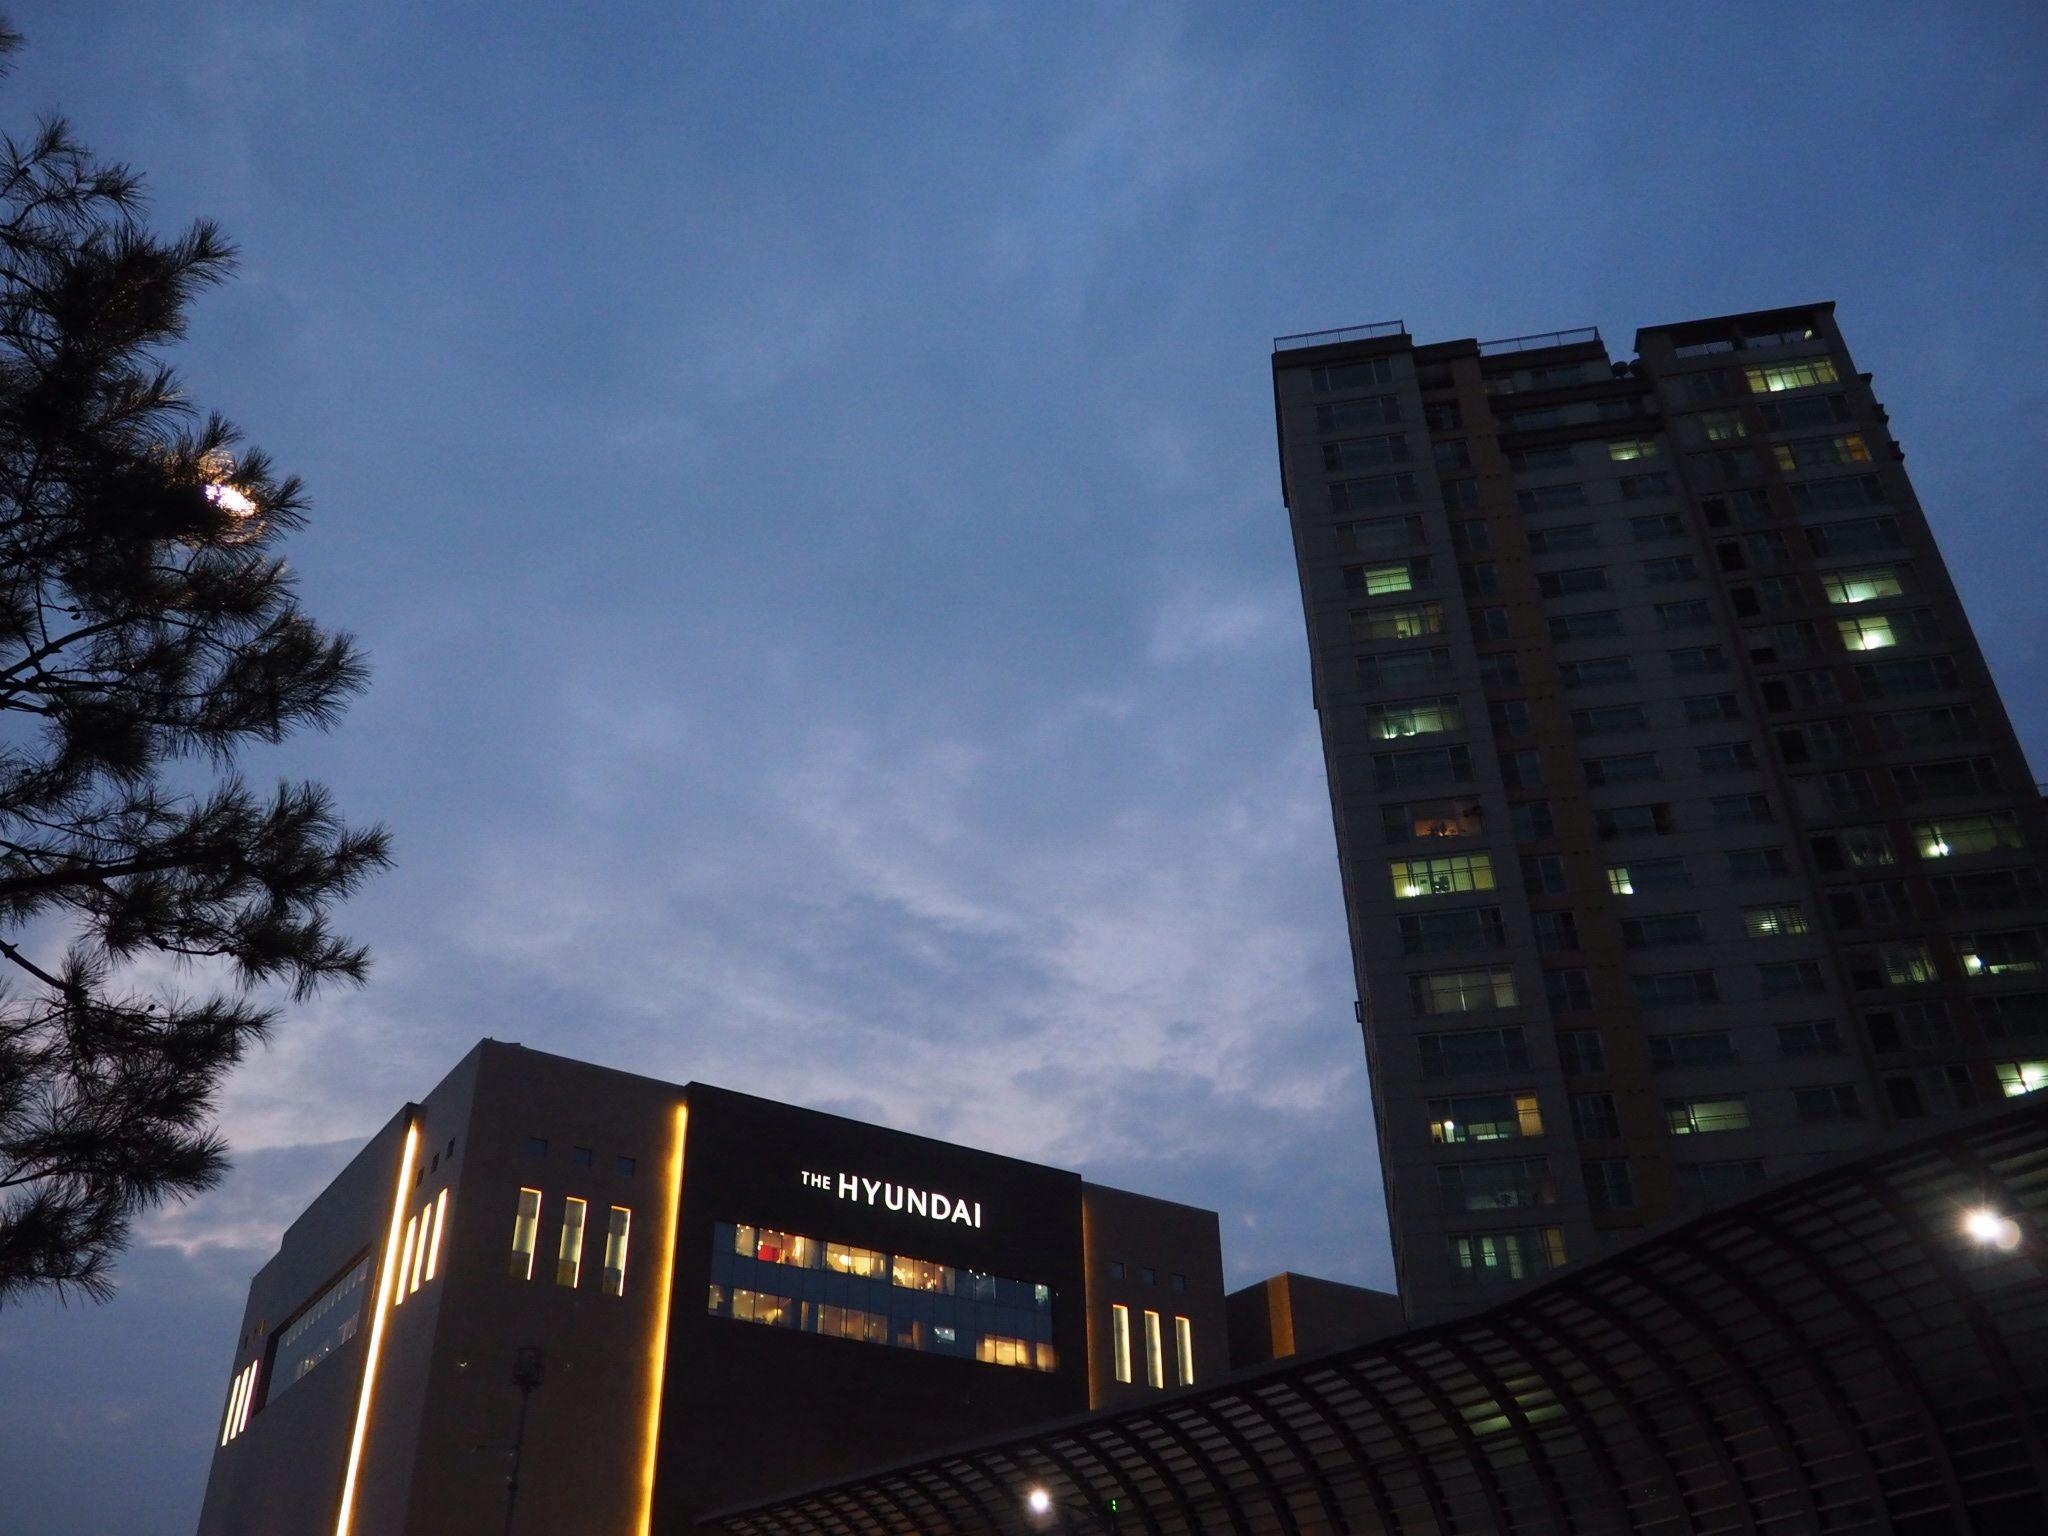 New Hyundai Department store in Bundang, Seoul, South Korea.   http://esperetravels.com